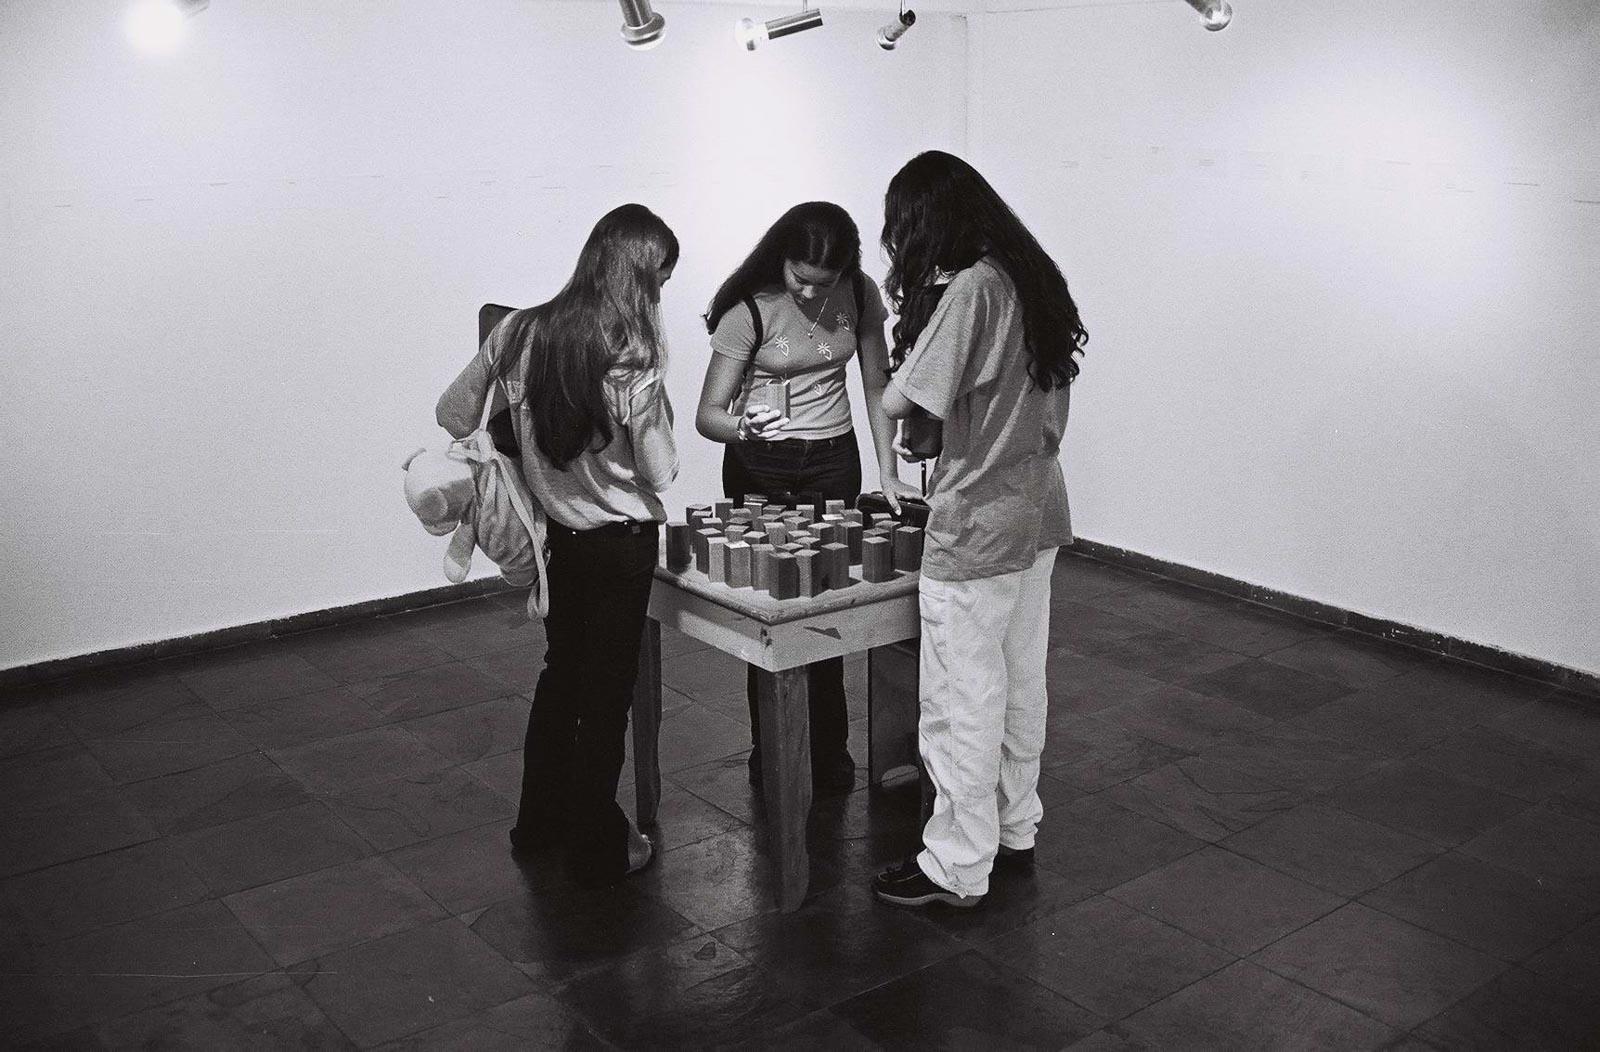 Território, 2000 - Espaço 508-Sul - Brasília